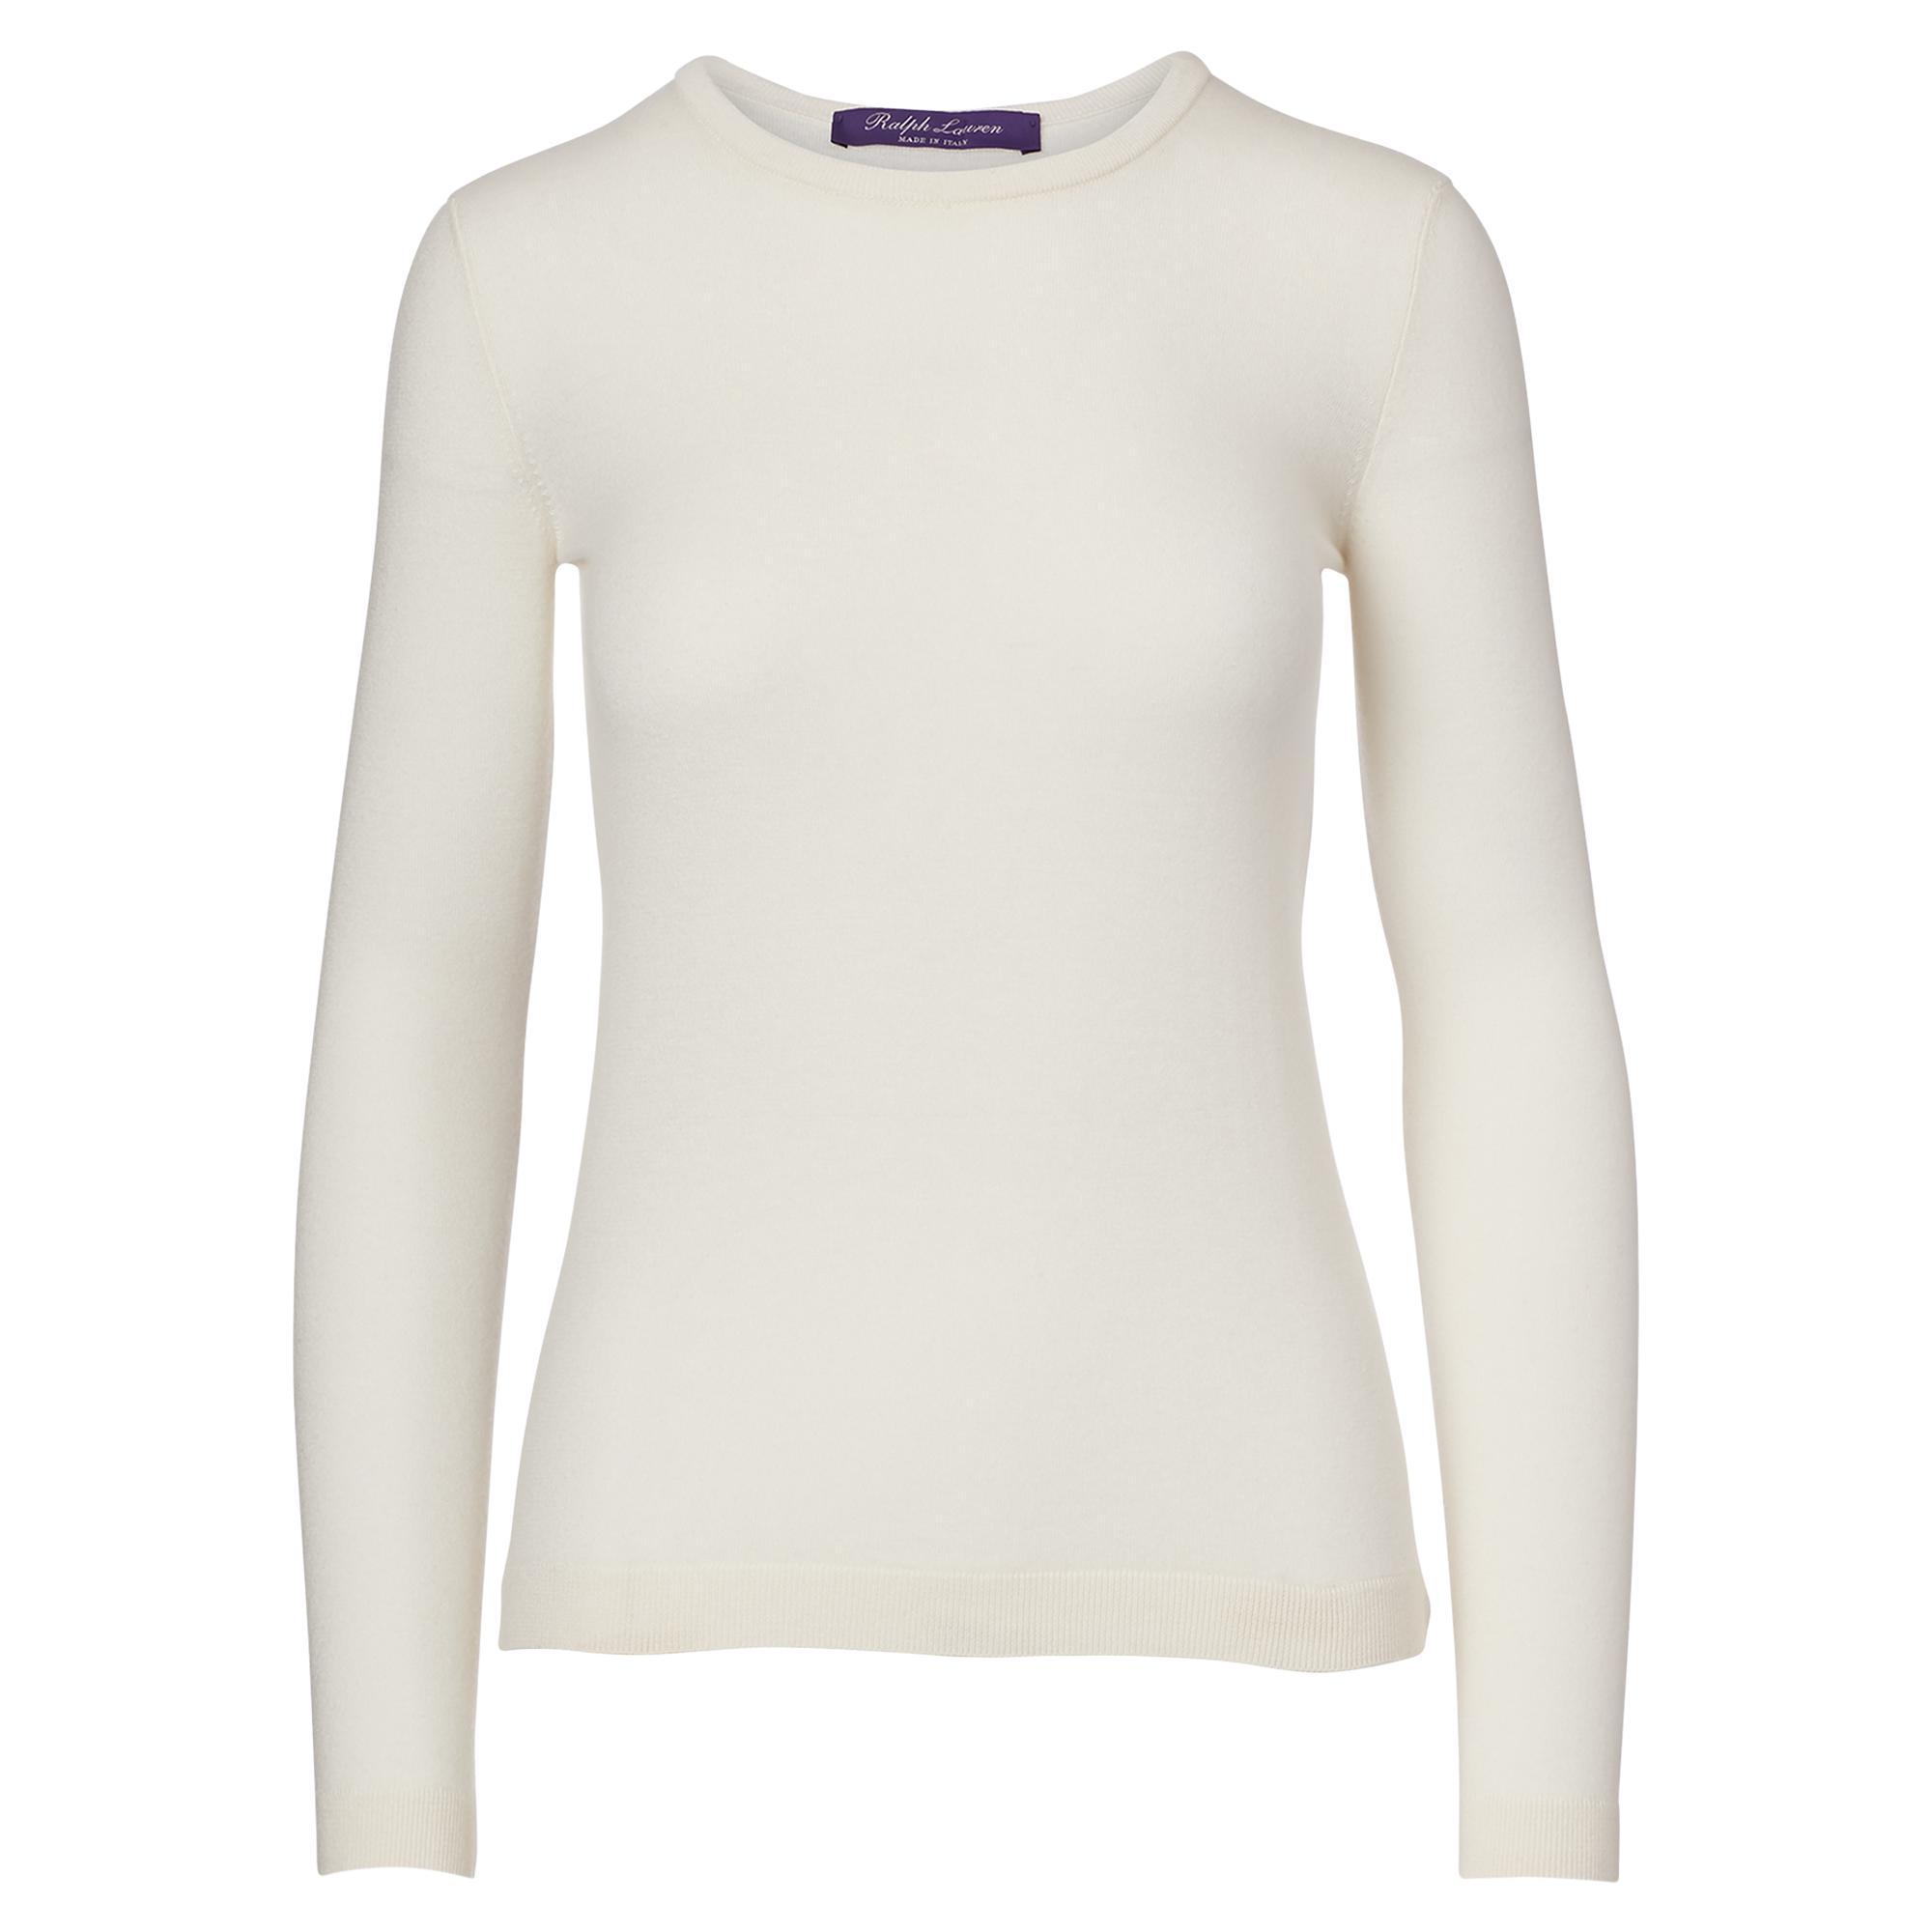 0badbb6dac4de7 Ralph Lauren Collection. Women s Cashmere Crewneck Sweater.  750 From  Orchard Mile ...